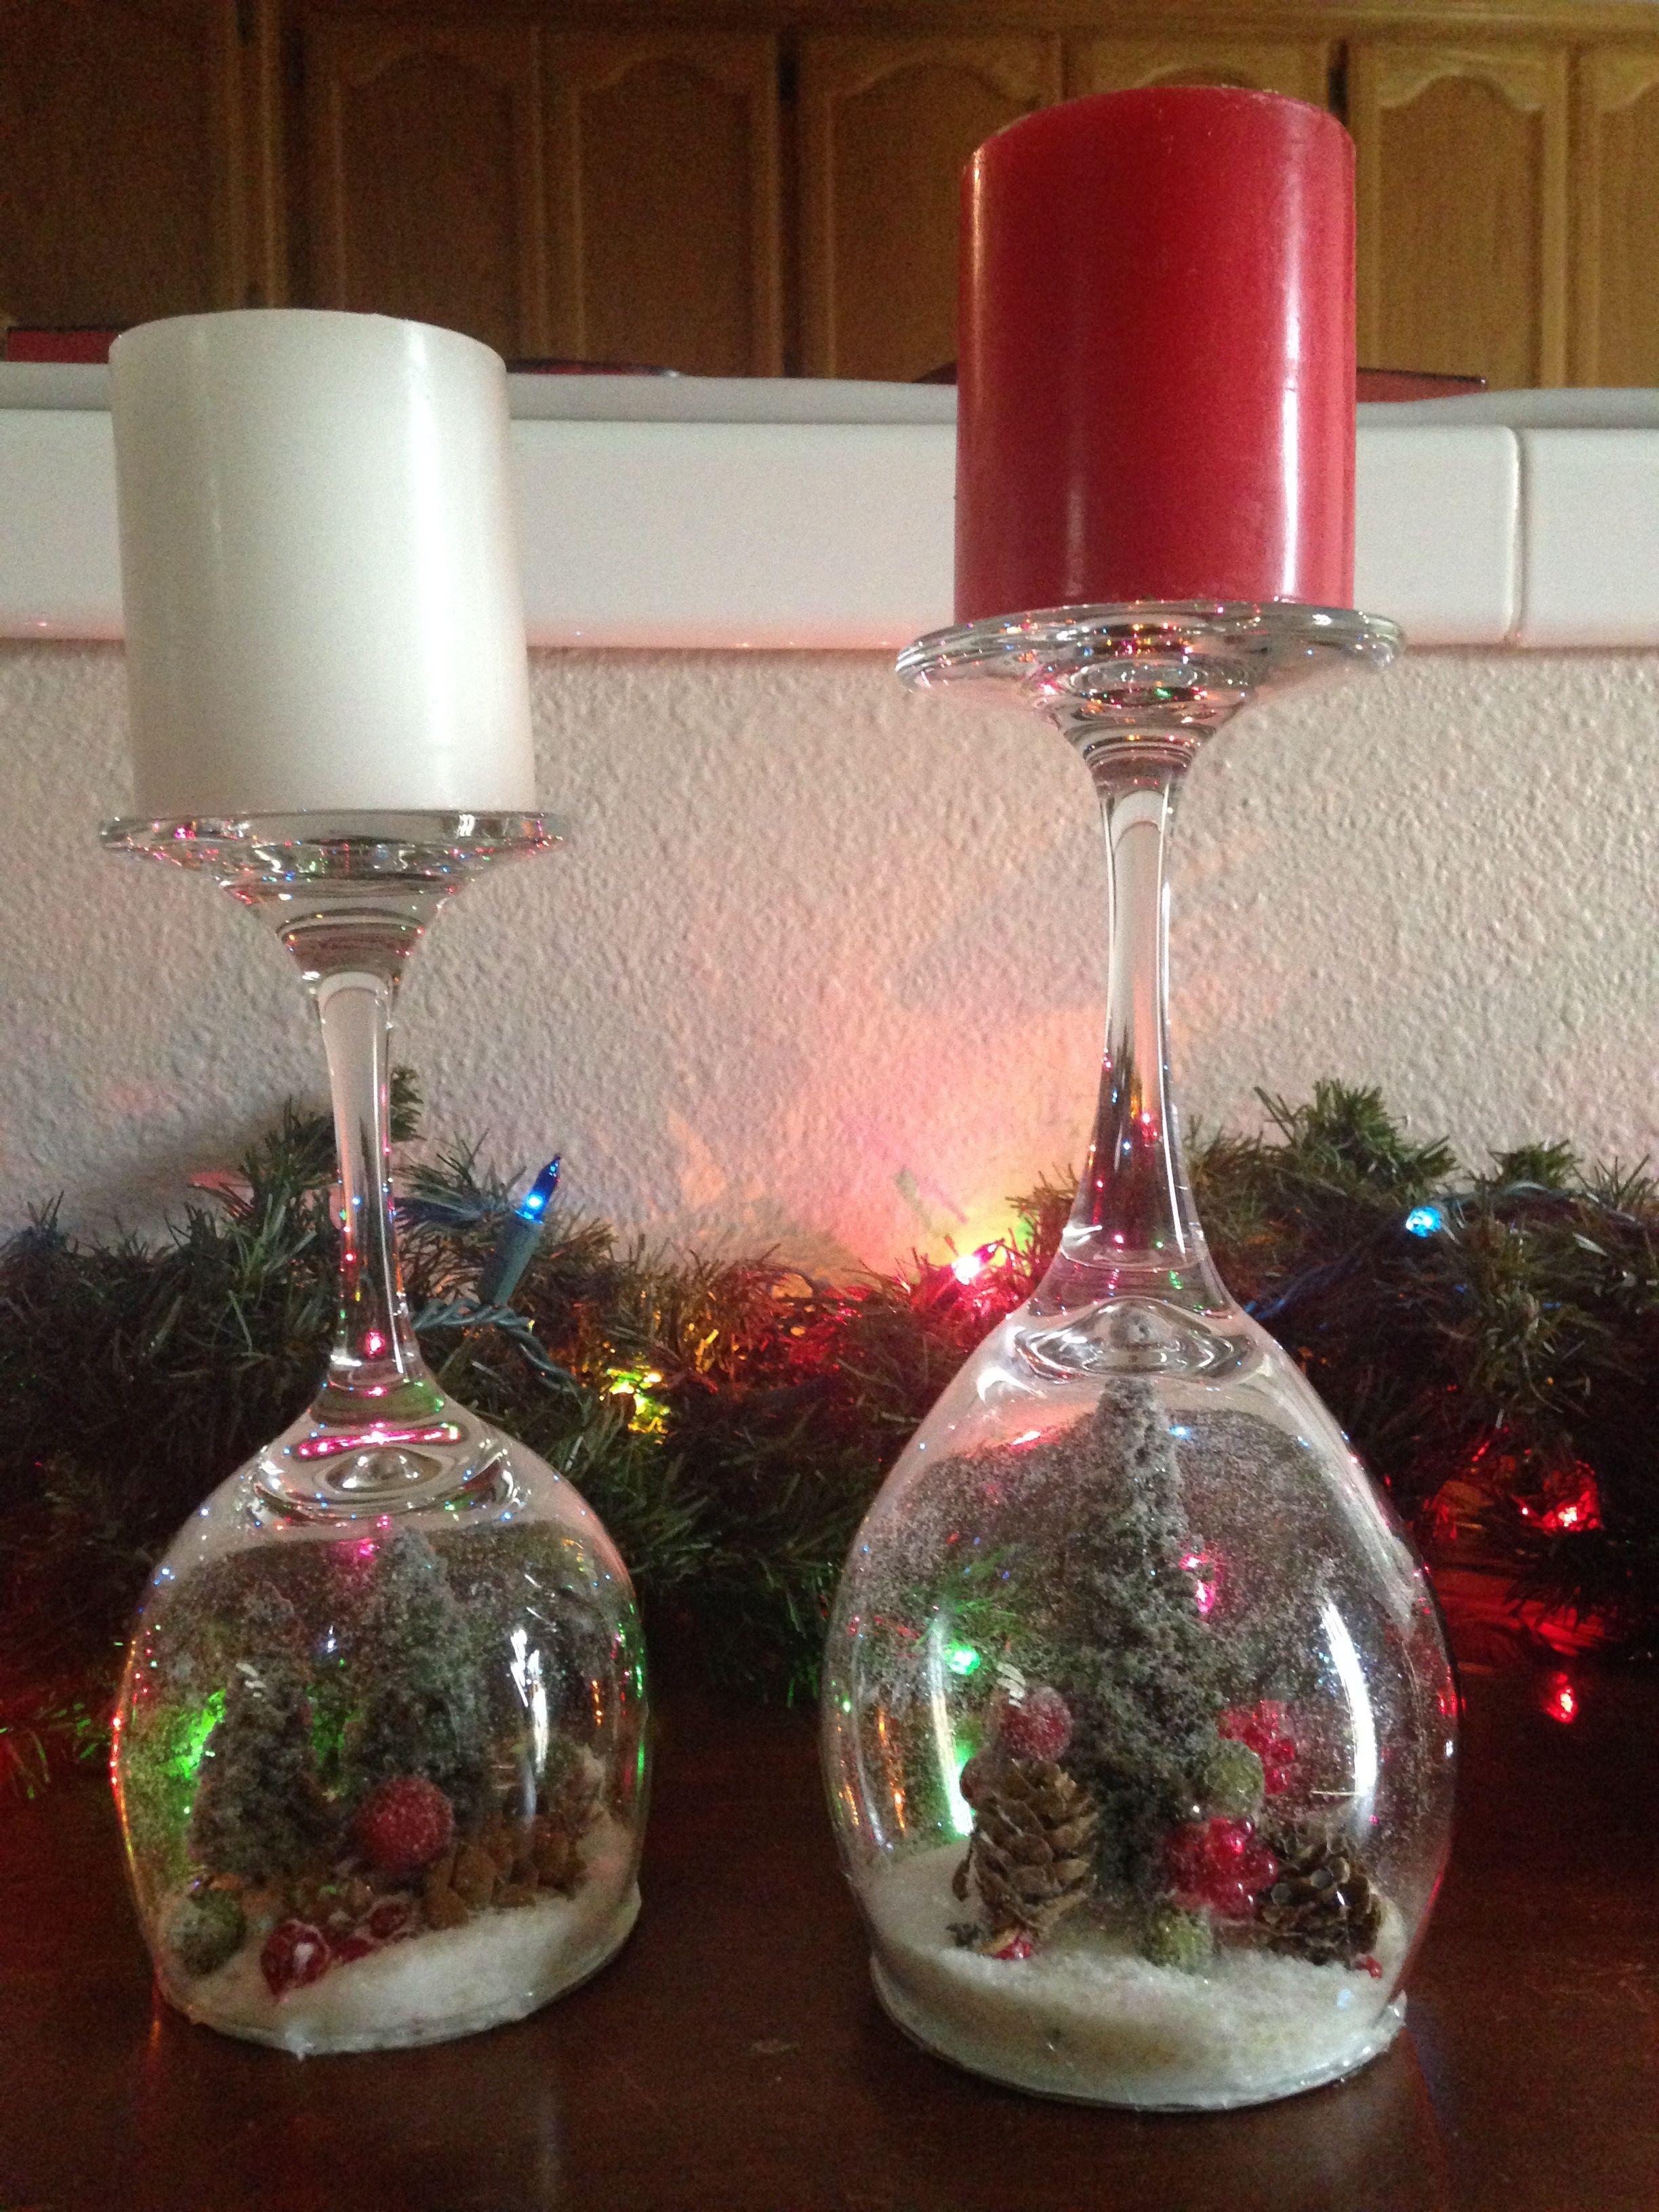 Diy Wine Glass Snow Globes Christmas Candles Diy Wine Glass